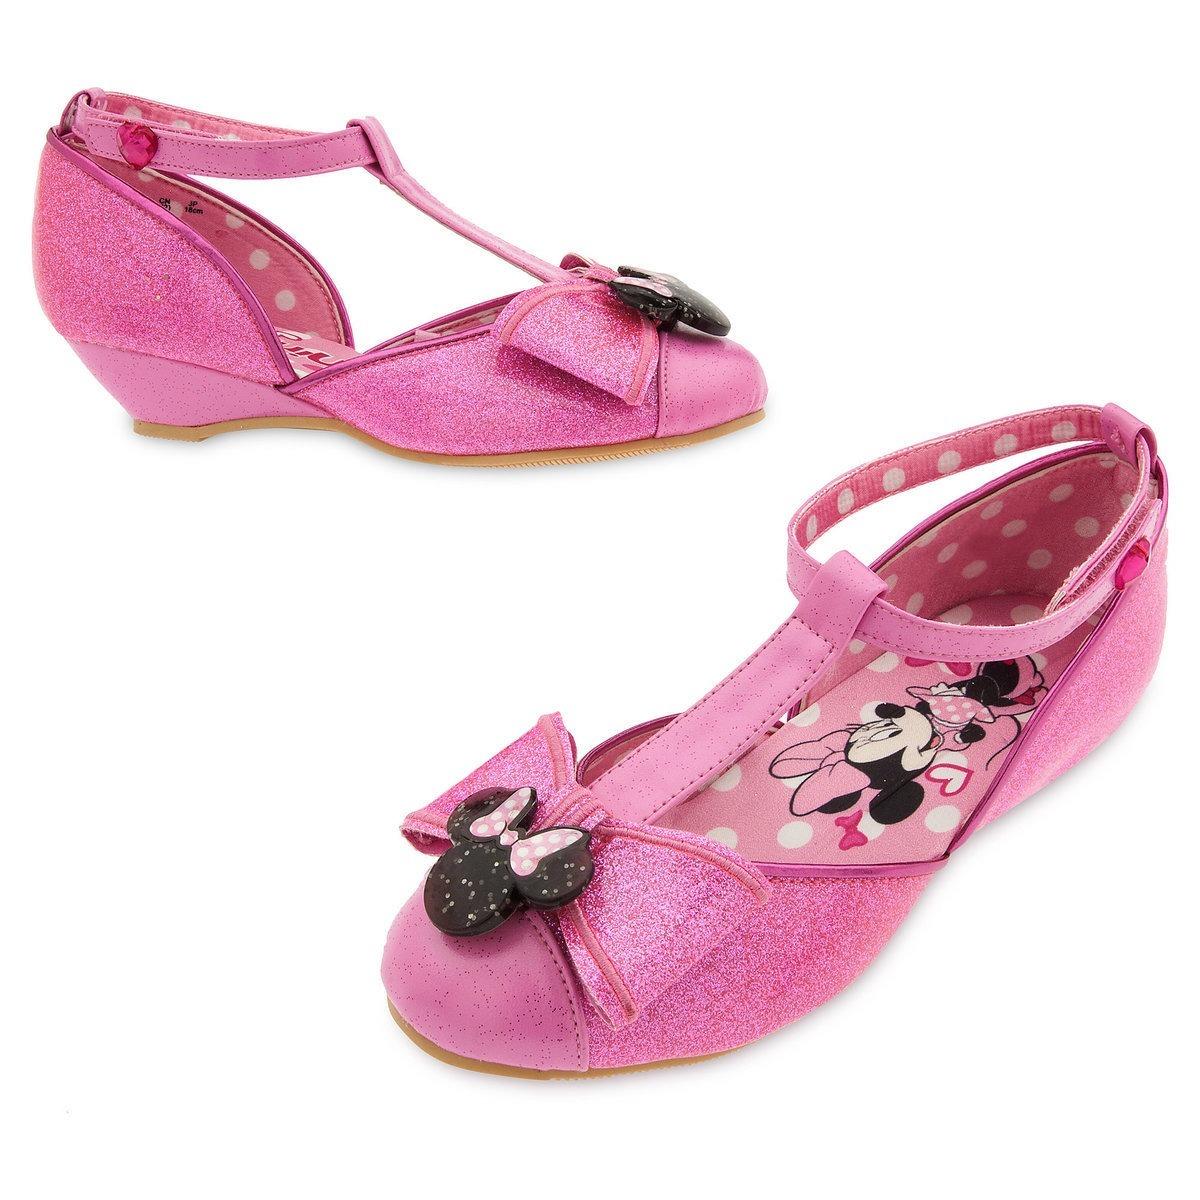 Minnie Talla Disfraz Disney Mouse 2324 Originales Zapatos aq0xwPBP